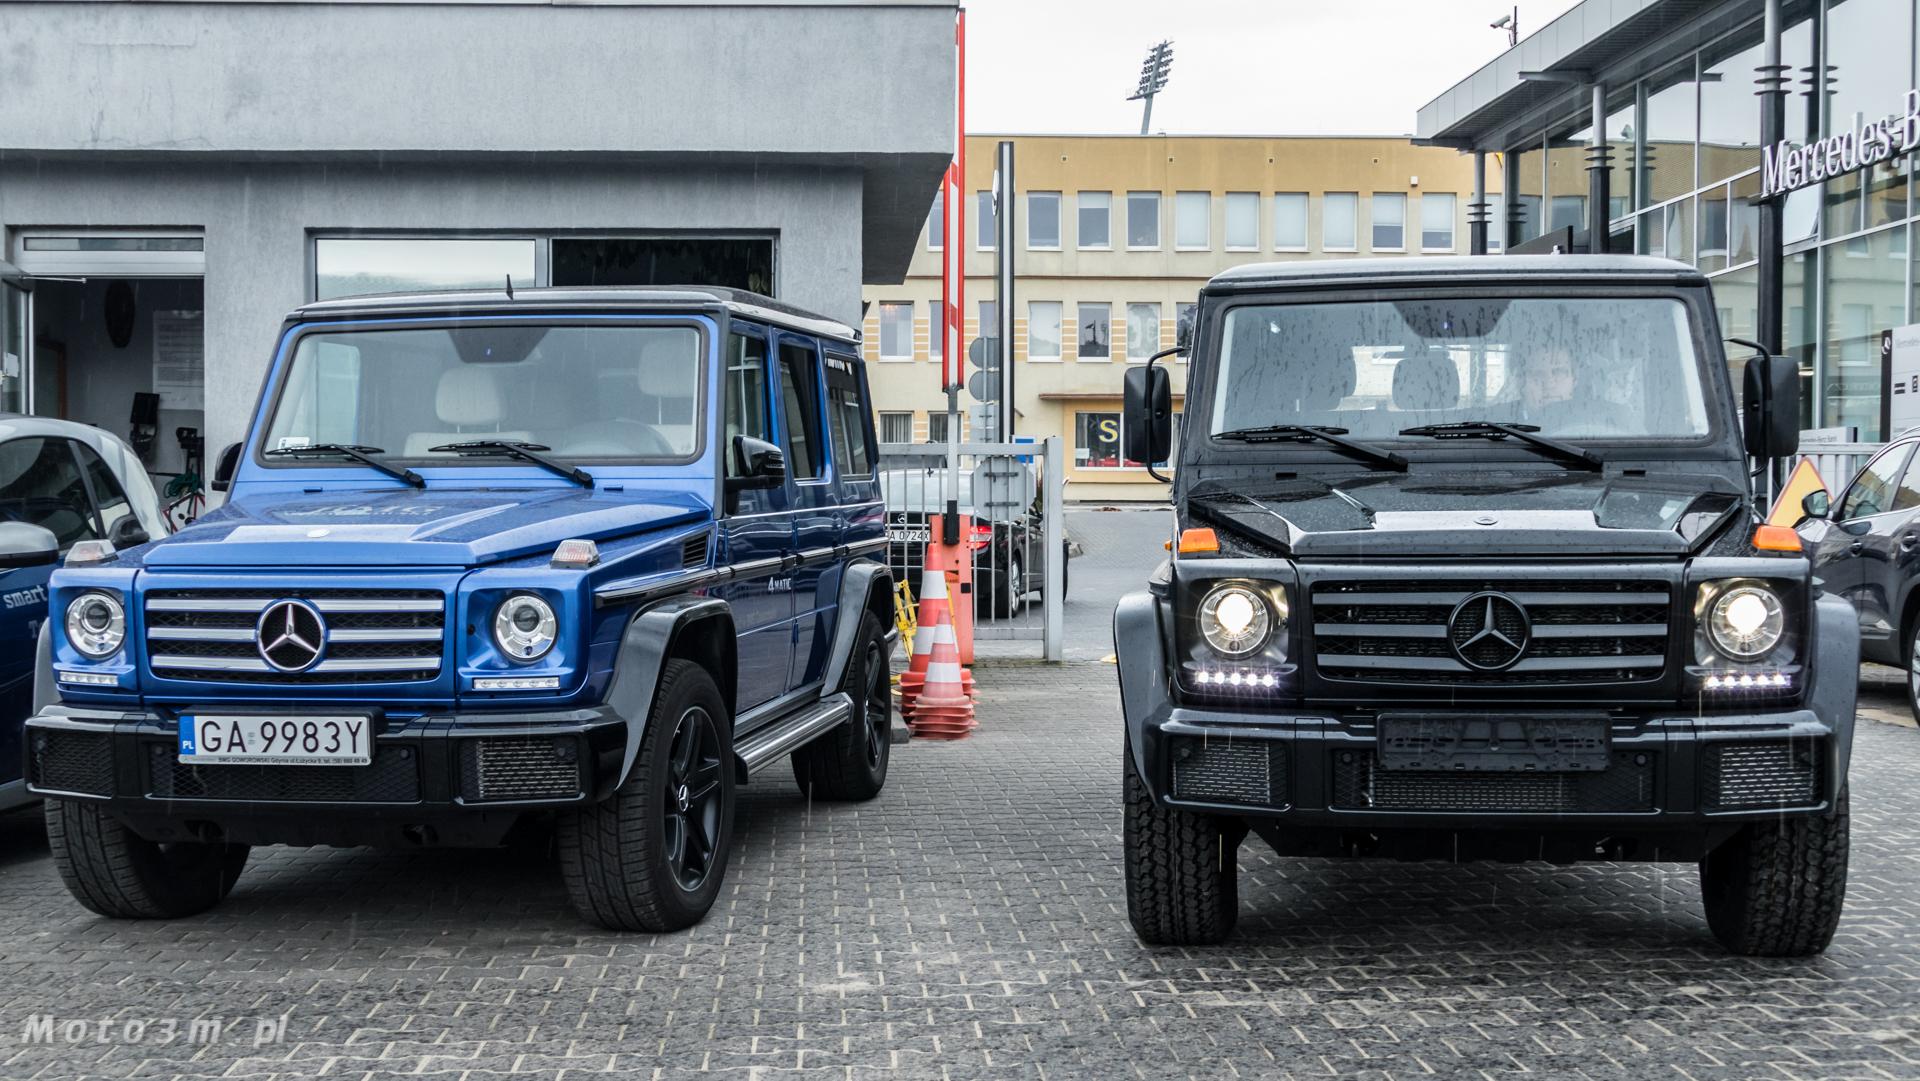 http://www.moto3m.pl/wp-content/uploads/2017/08/Mercedes-Benz-G350d-Professional-w-BMG-Goworowski-1560325.jpg